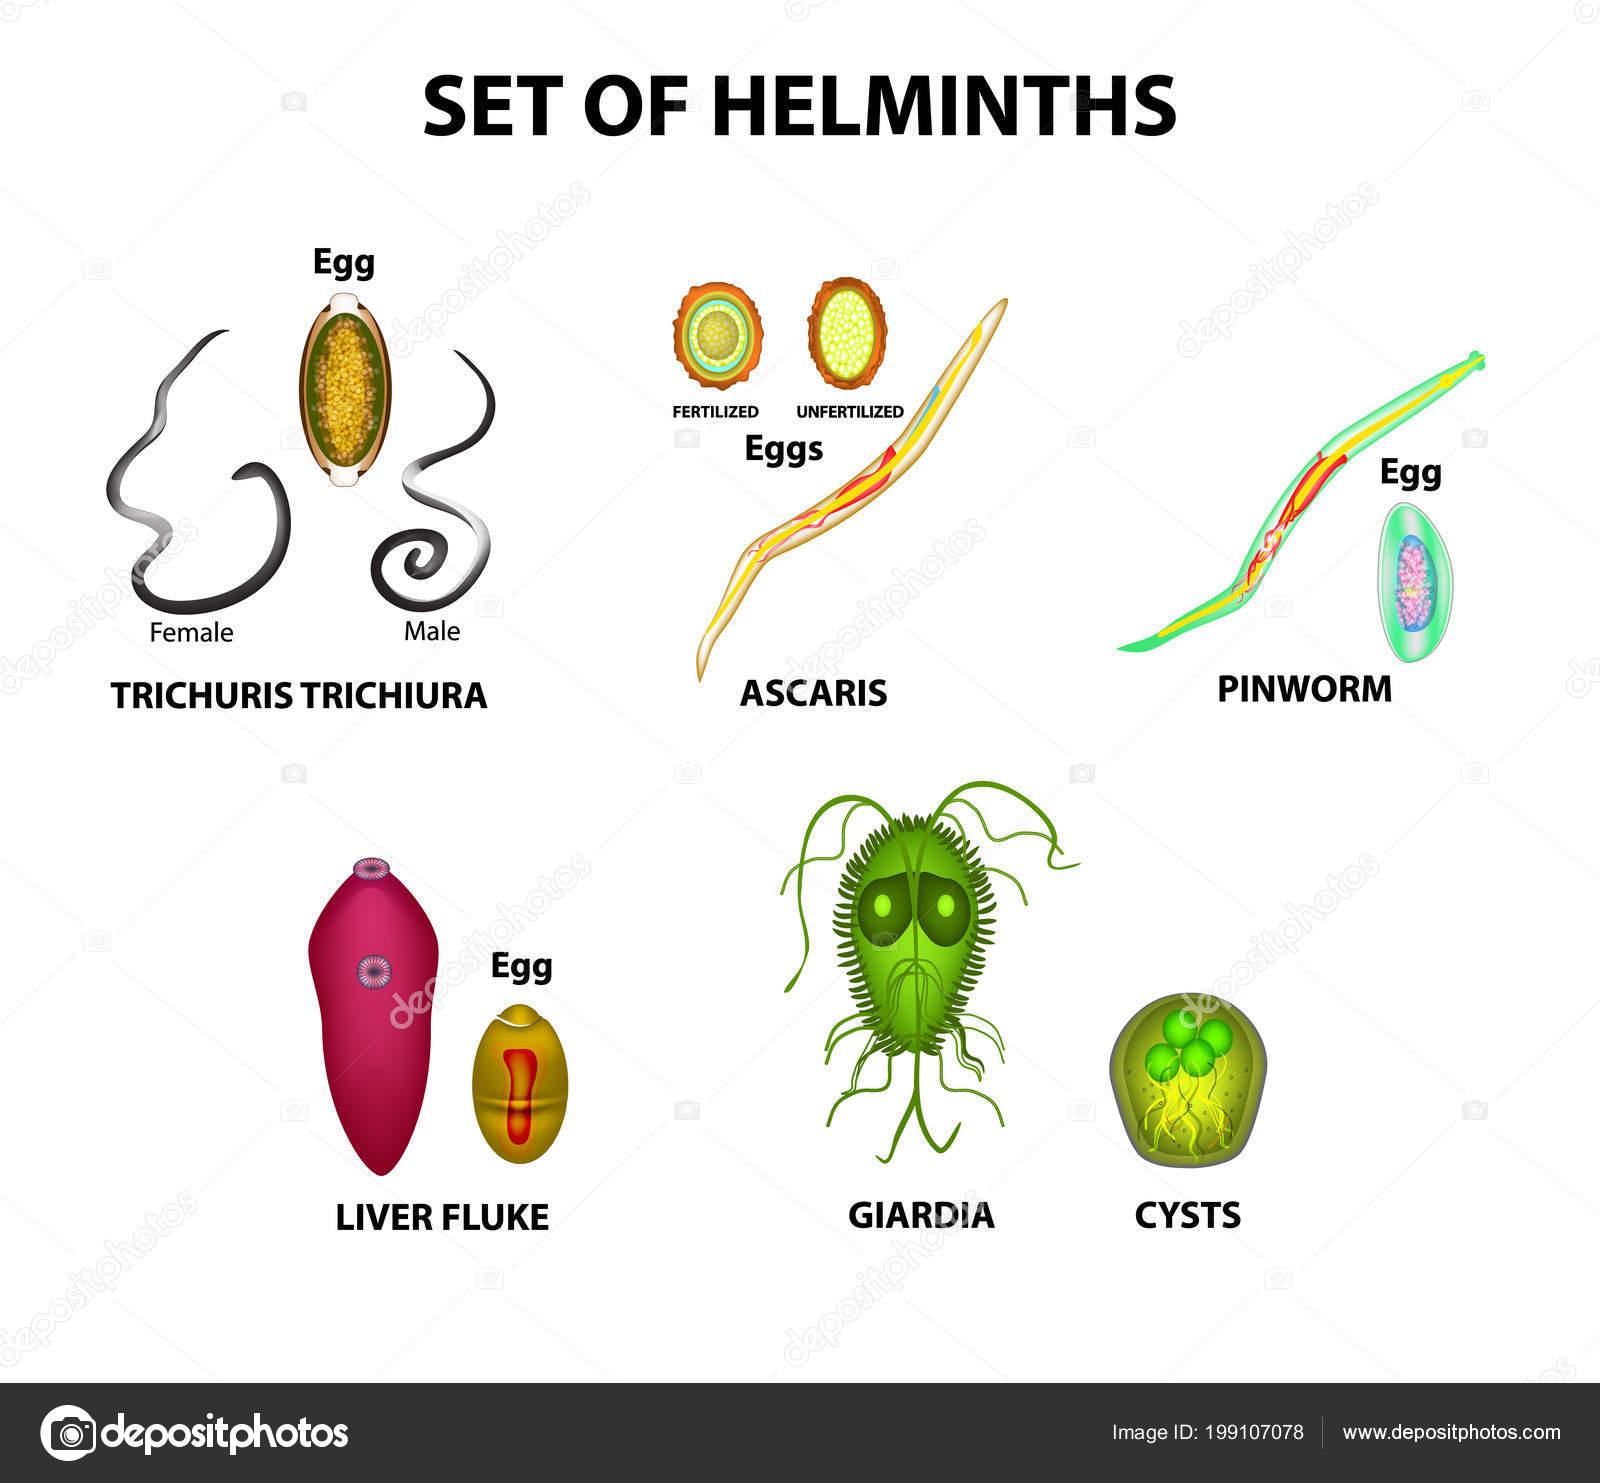 Helminths adalah